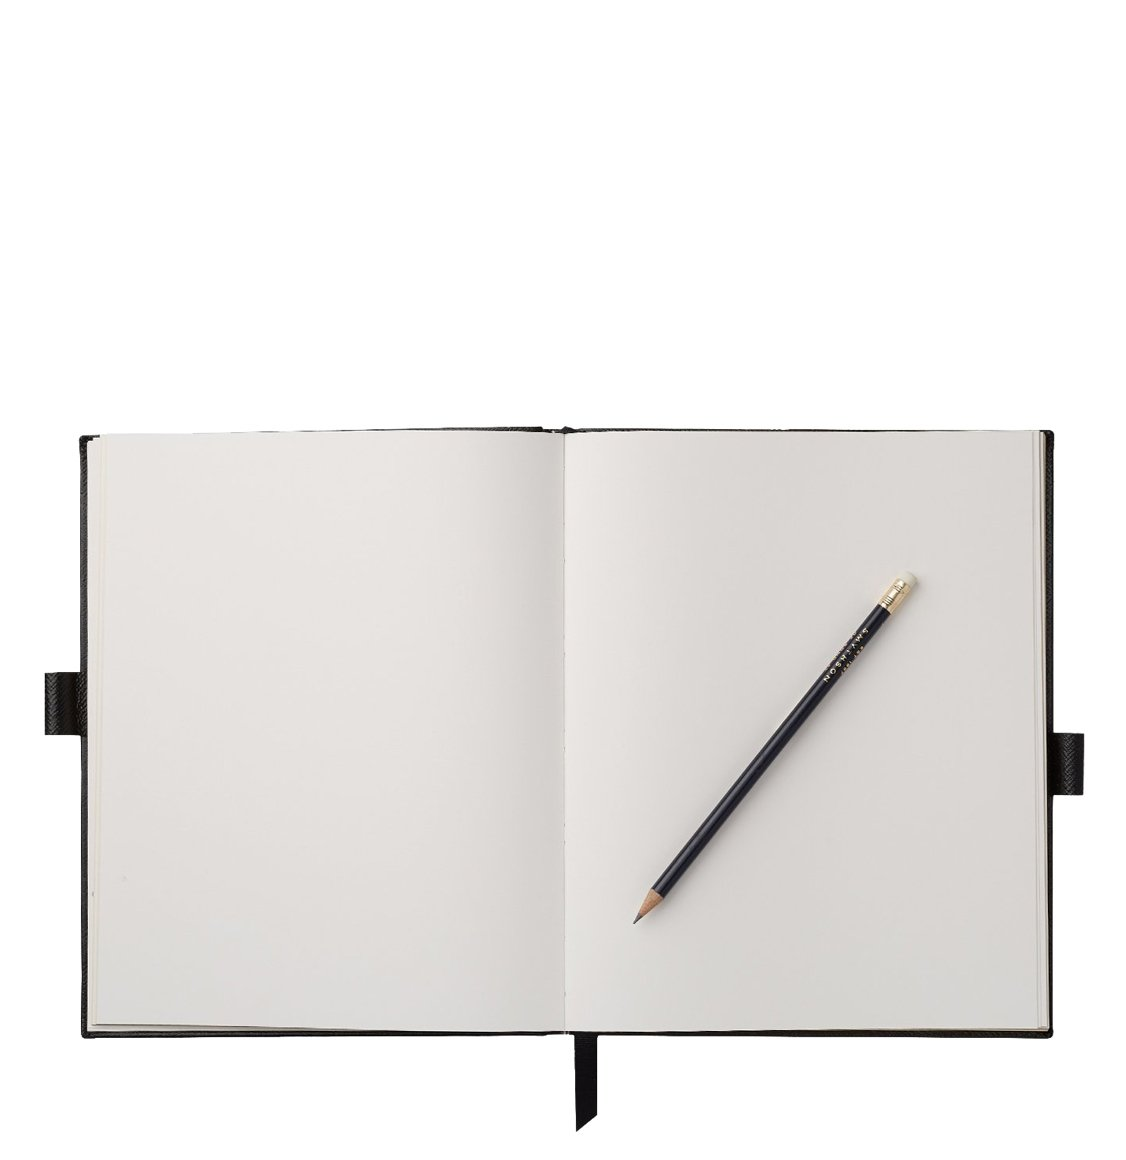 Smythson Portobello Leather Sketchbook